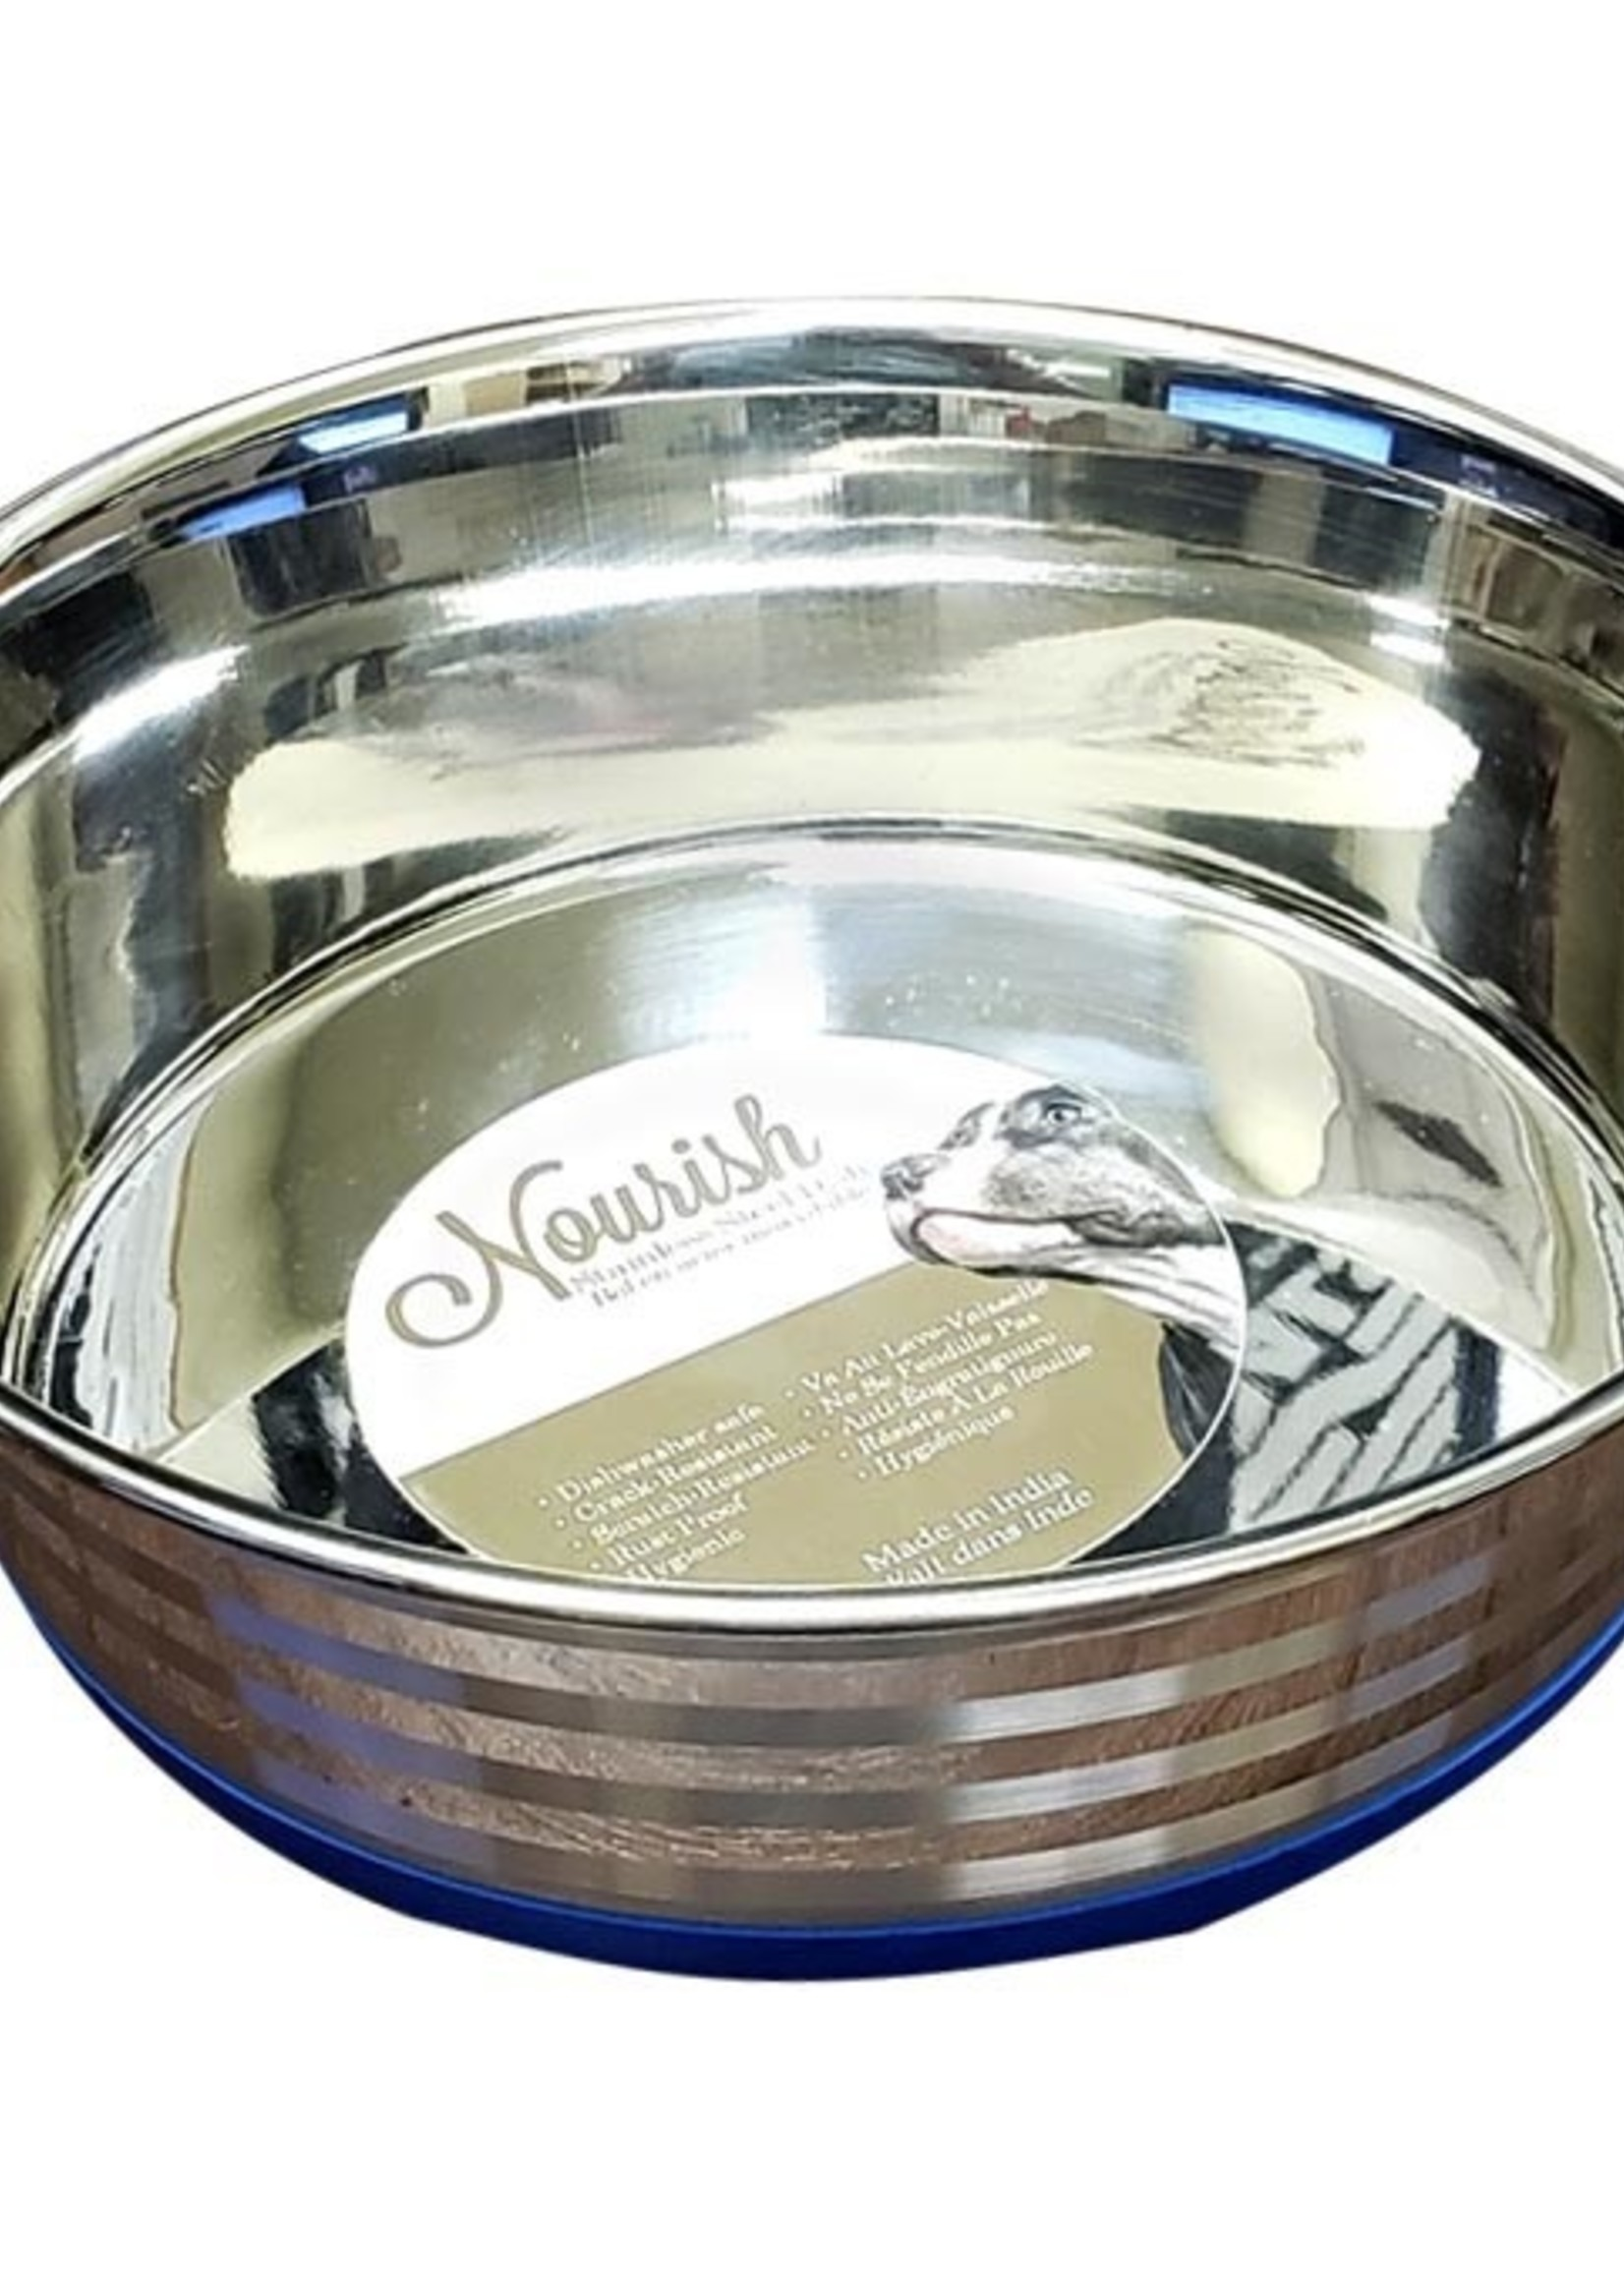 Nourish Stainless Steel Anti-Skid Bowl - Heavy - Stripes 90oz